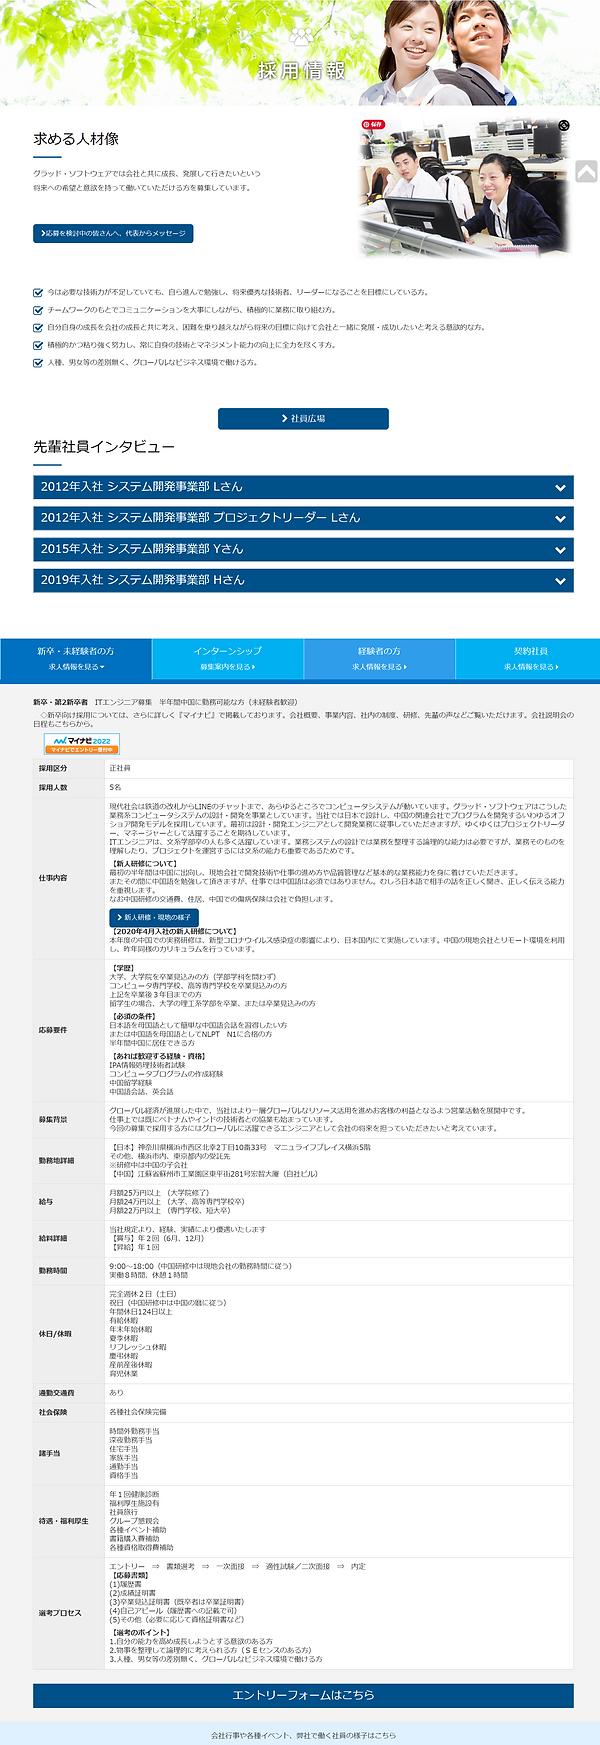 Screenshot (17).png